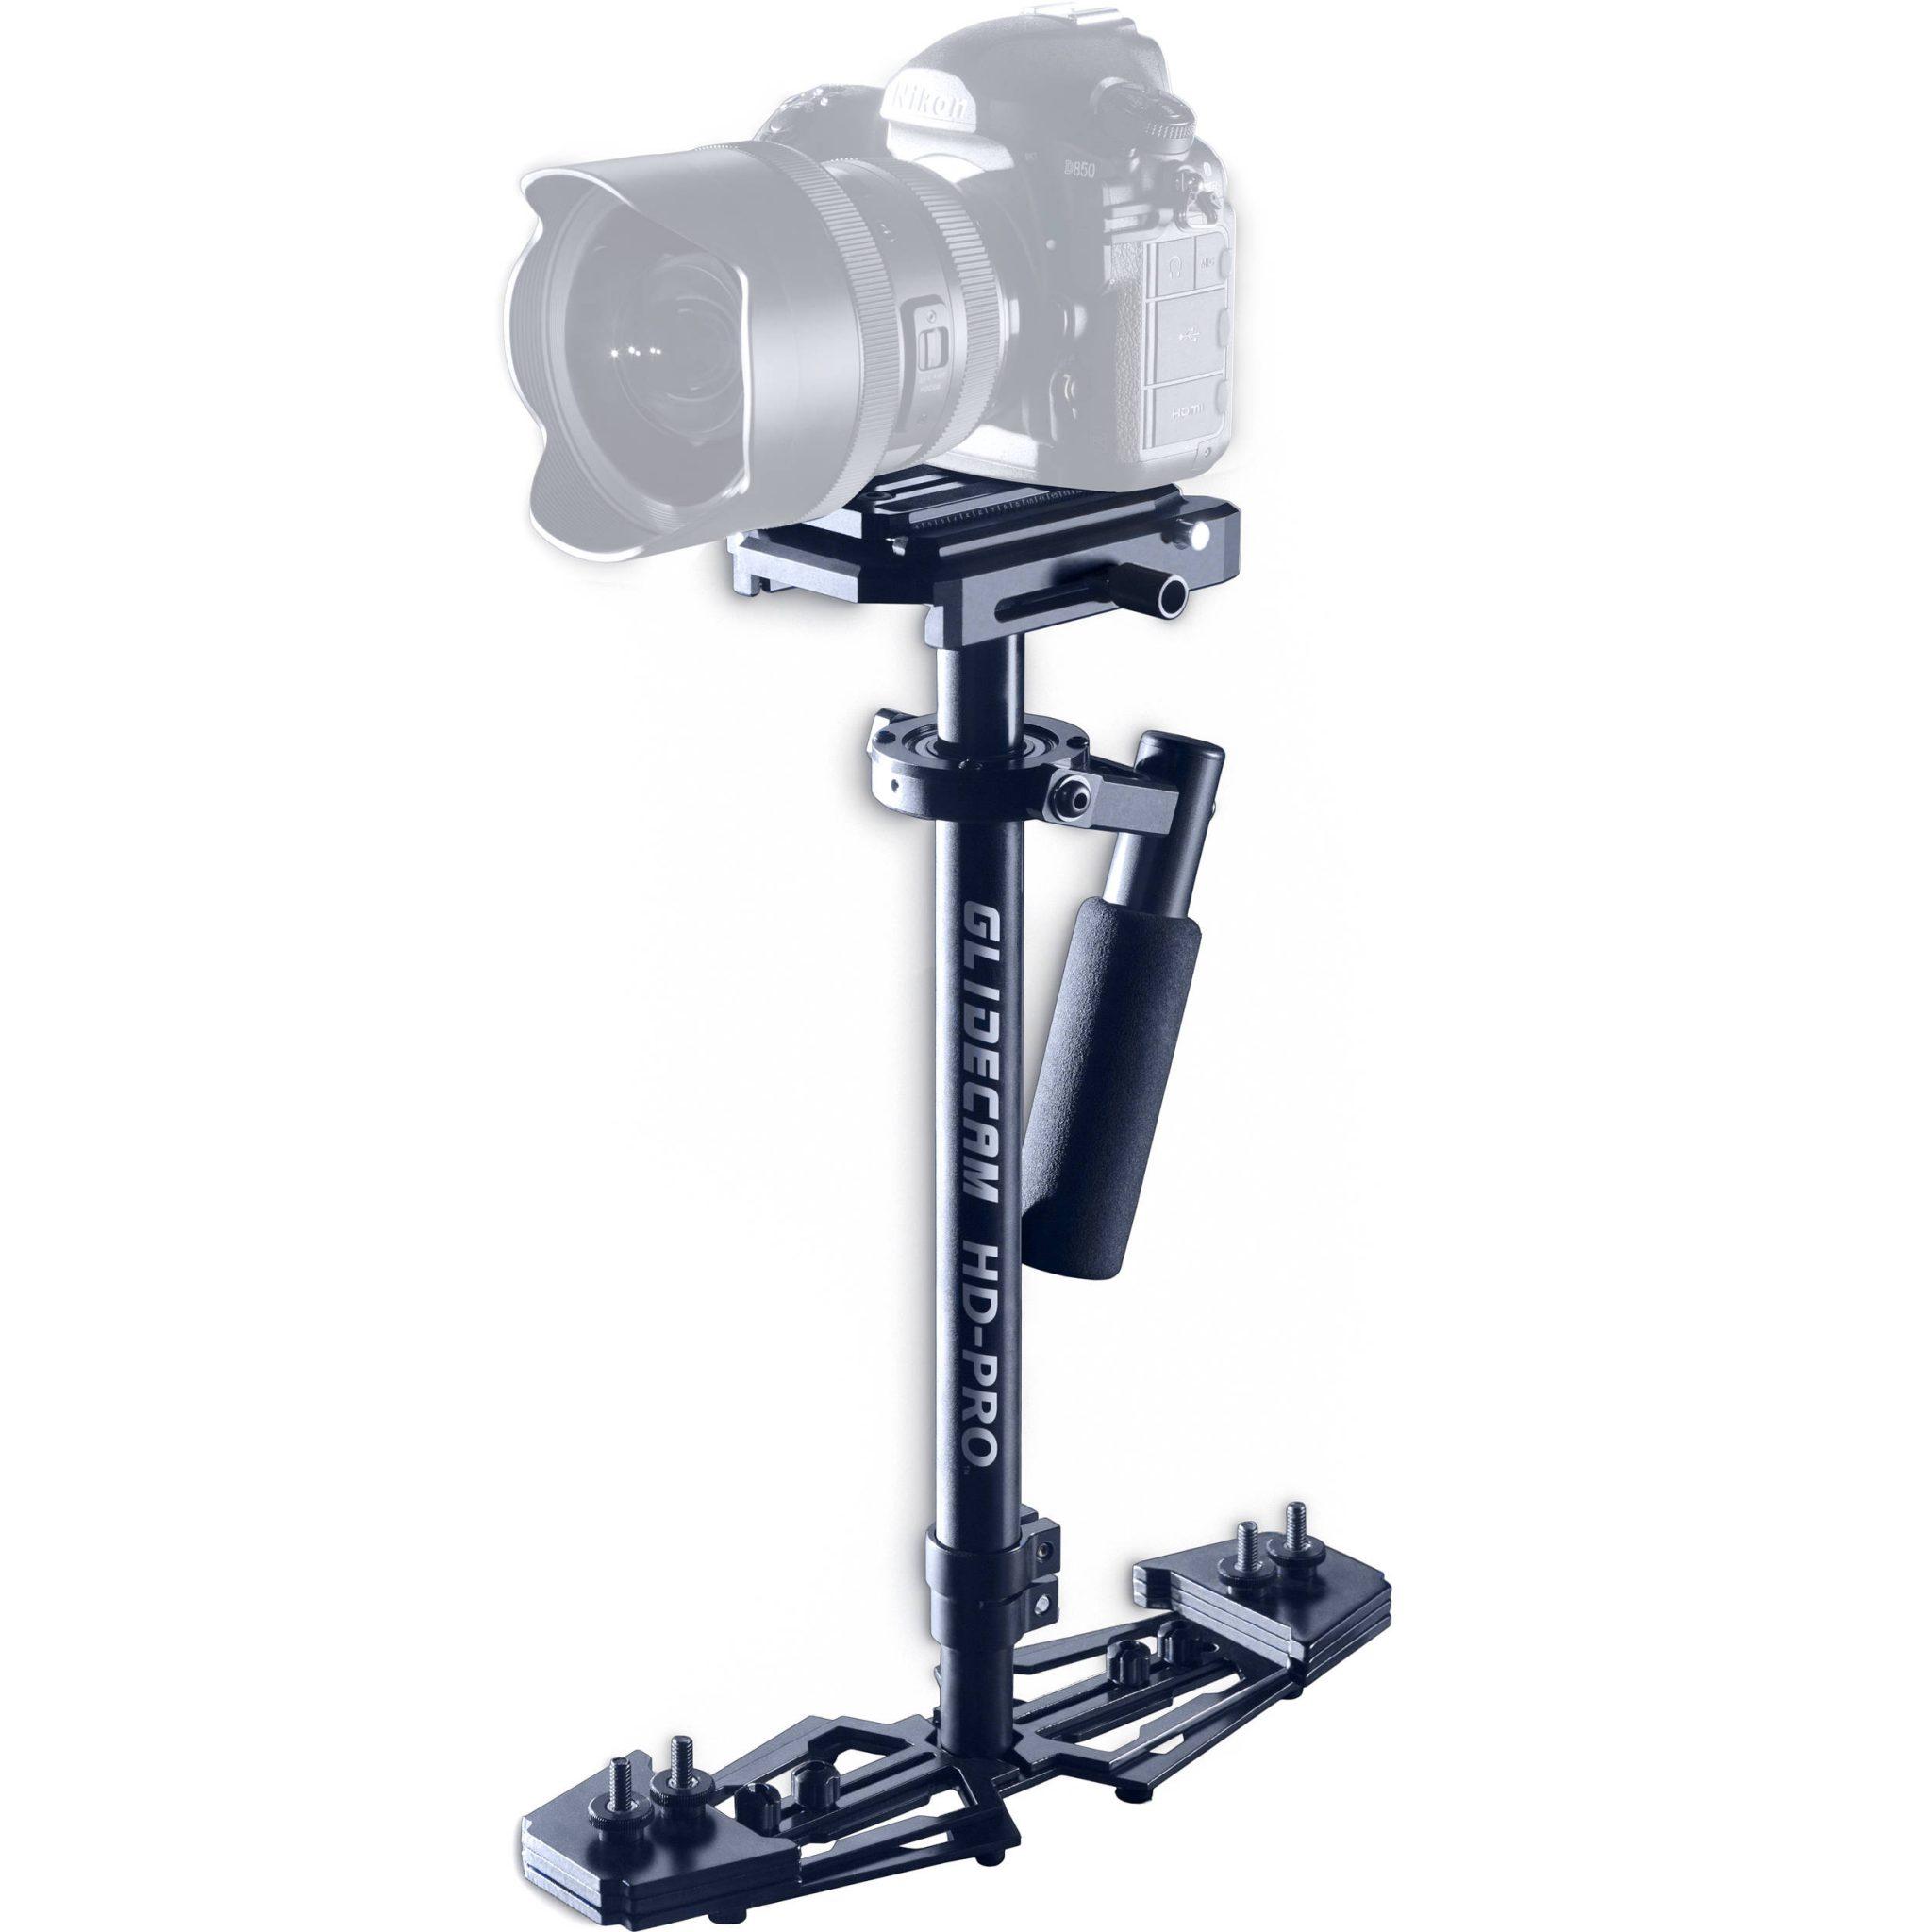 Glidecam HD-PRO | HDPRO Handheld Camera Stabilizer for filmmaker